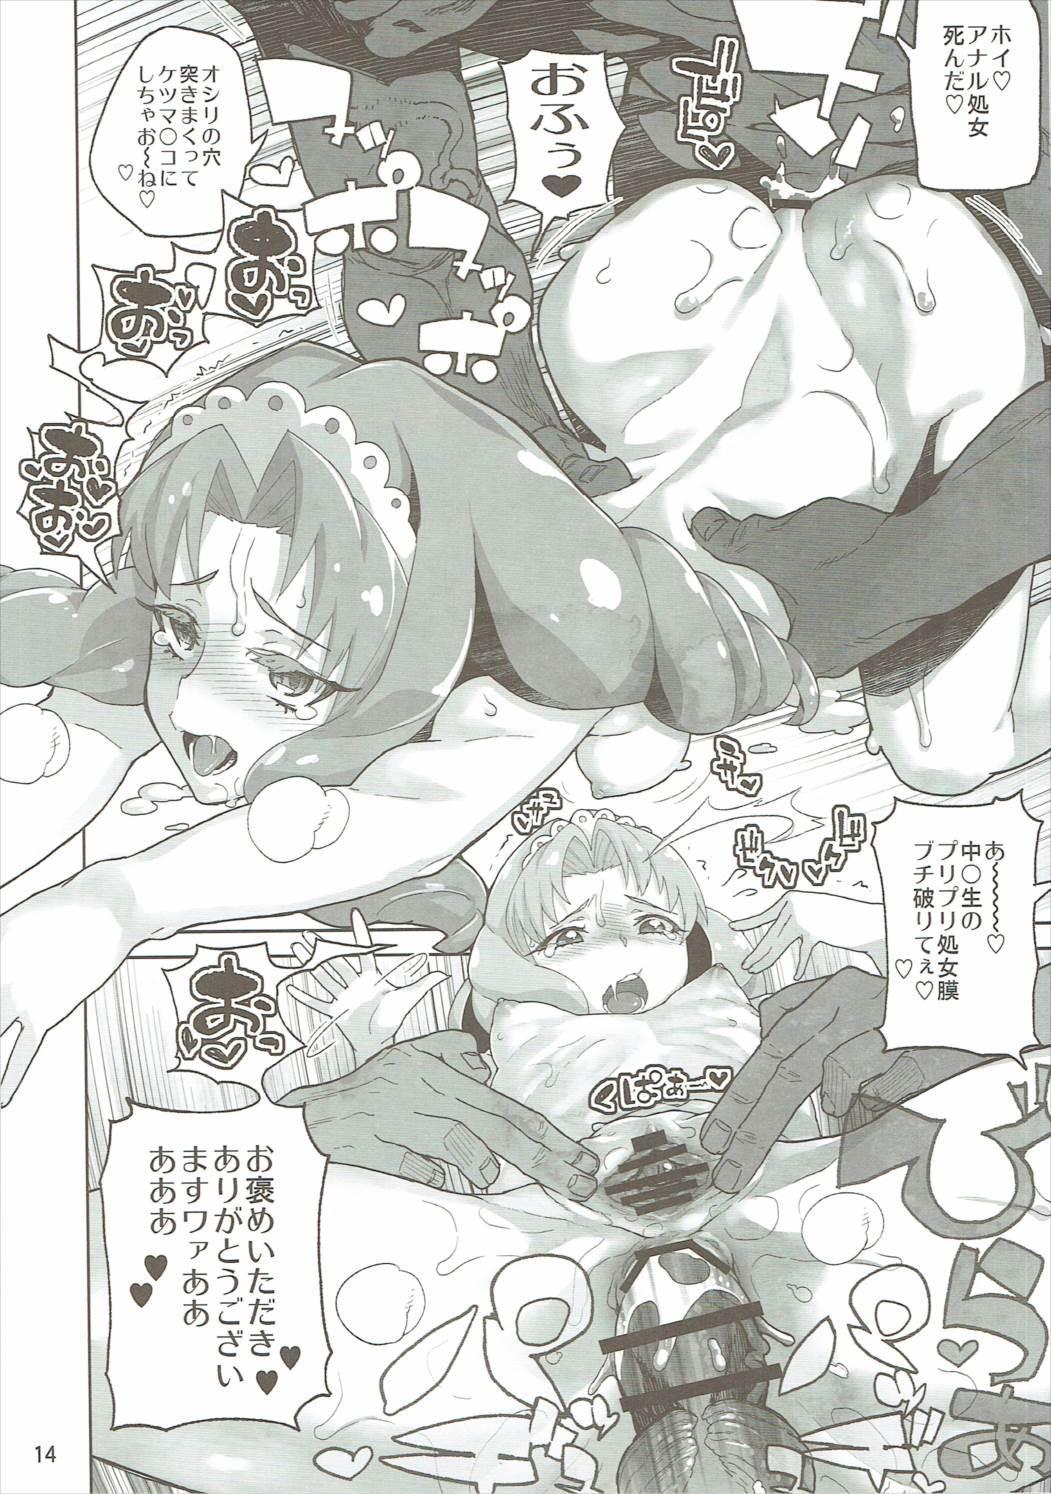 Amanogawa Kirara + Himelda + Mapuri Soushuuhen 12